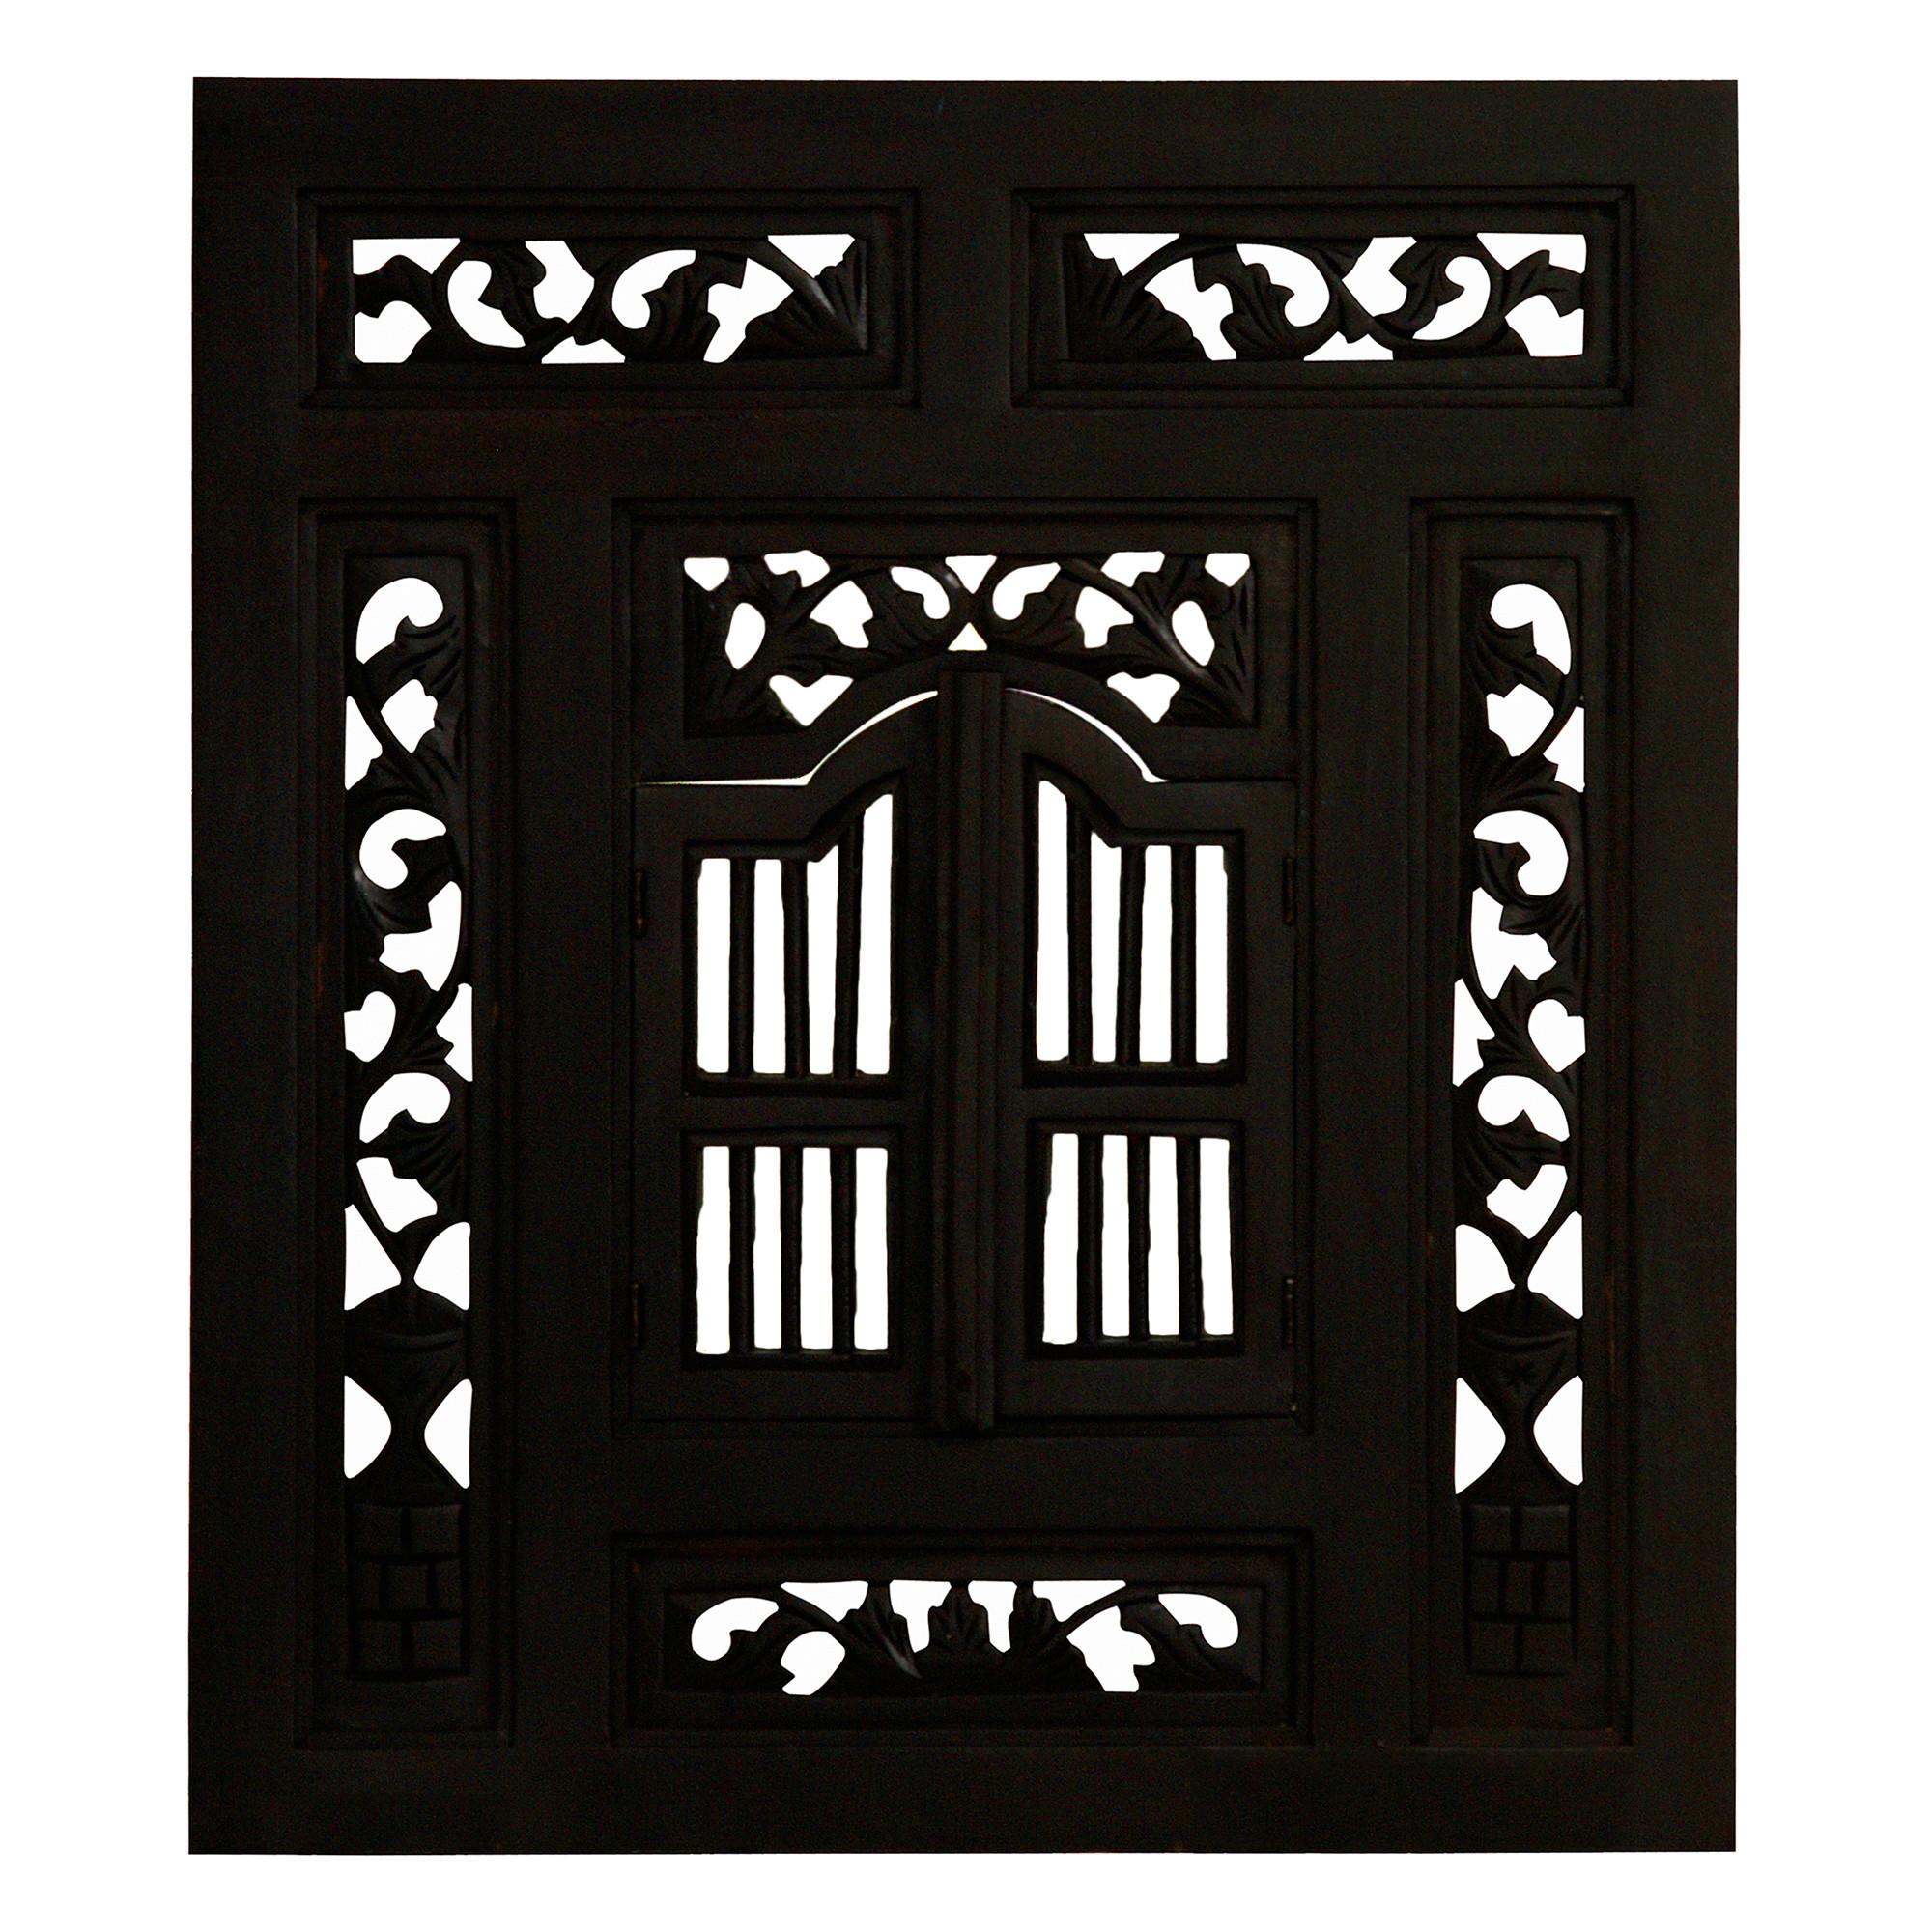 Prison Mahogany Timber Frame Window Wall Mirror, 130cm, Chocolate